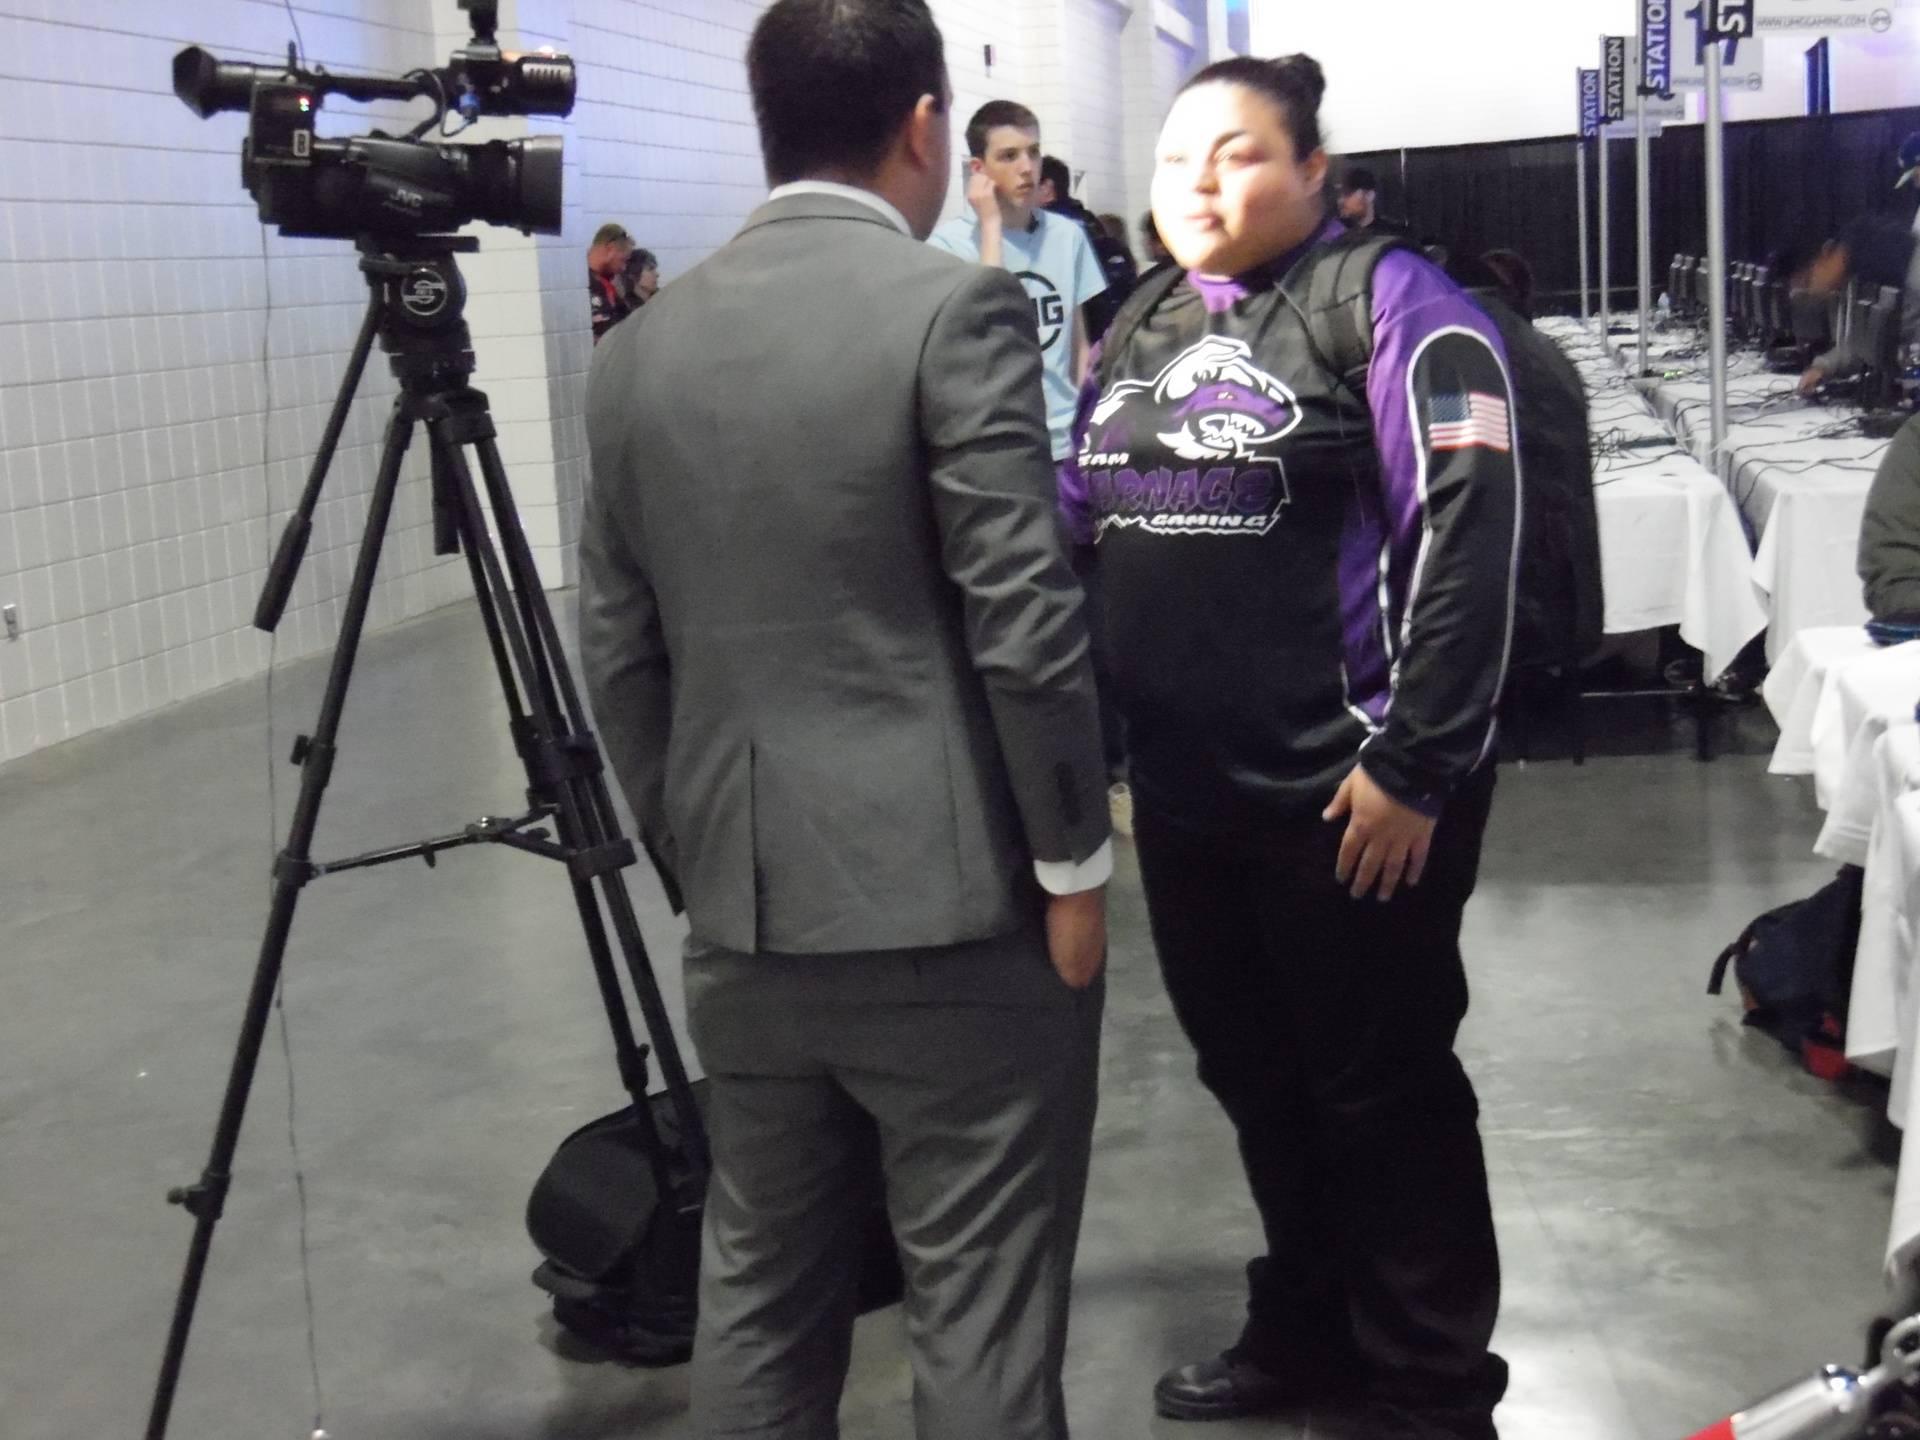 Tashaa being interviewed by local news